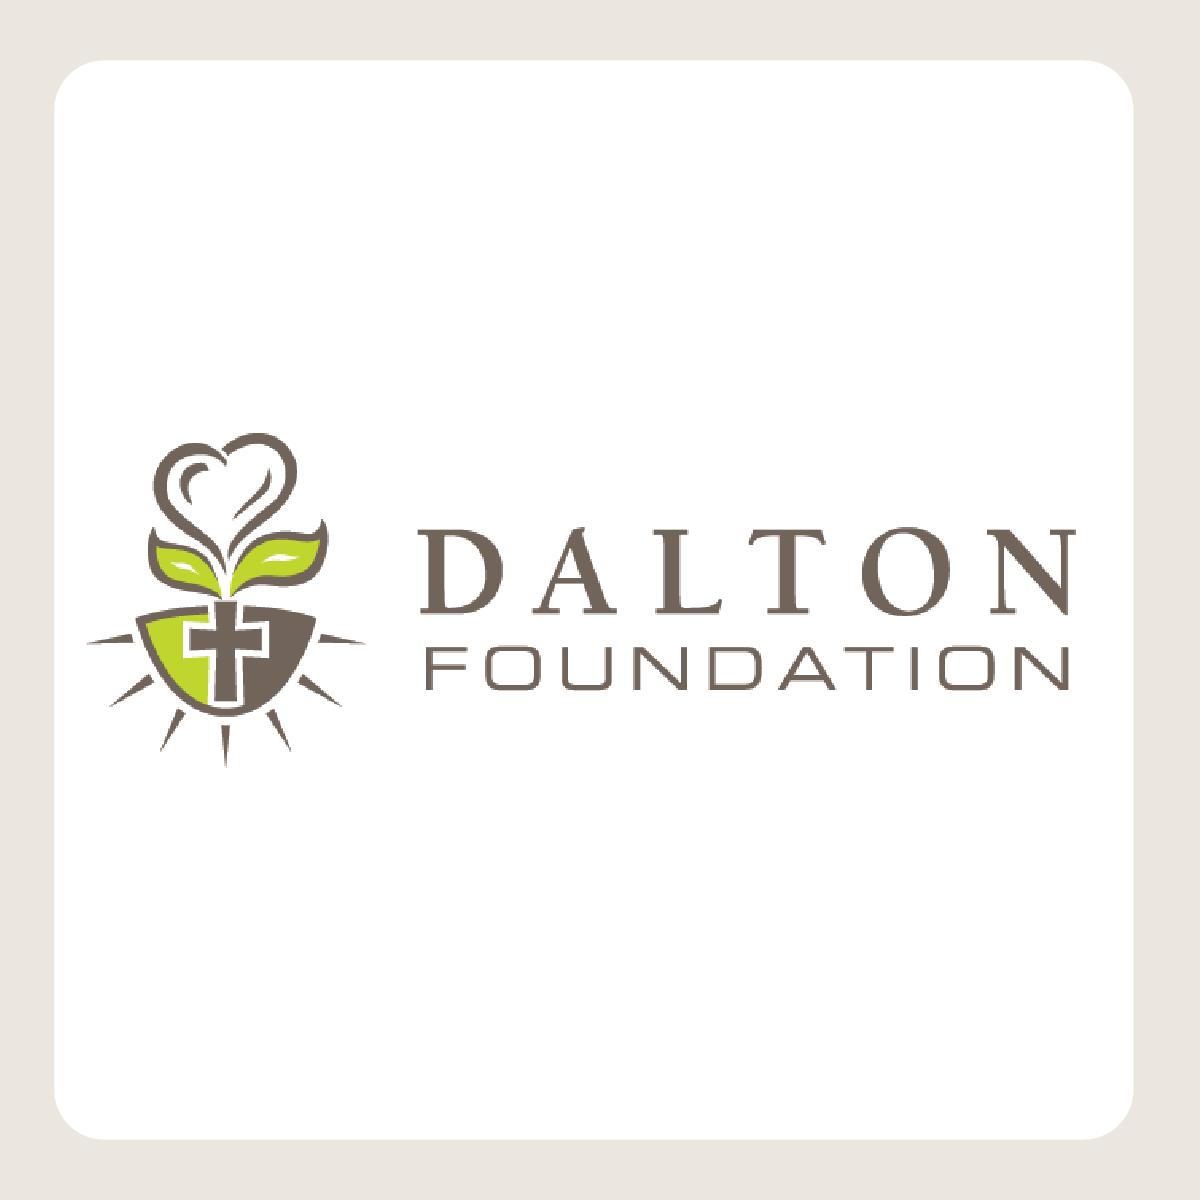 daltonfoundation-01.png